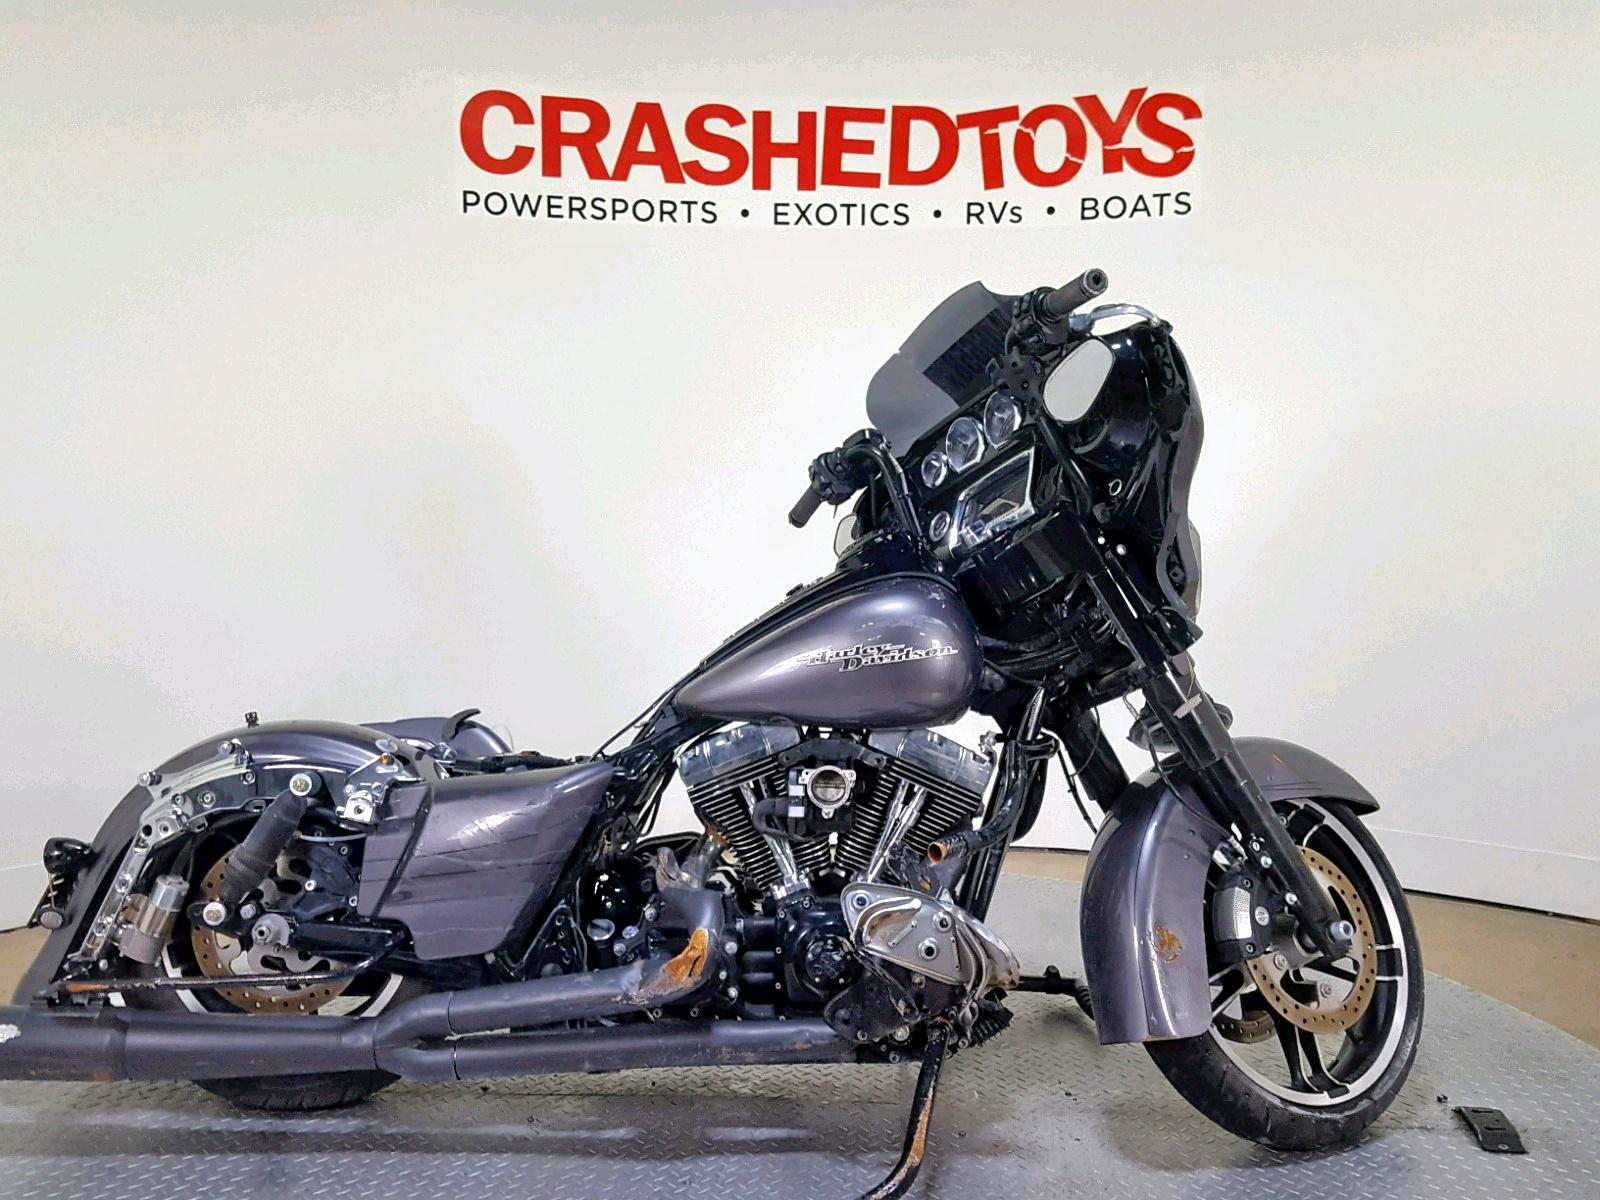 Salvage 2014 Harley-Davidson FLHXS STREET for sale